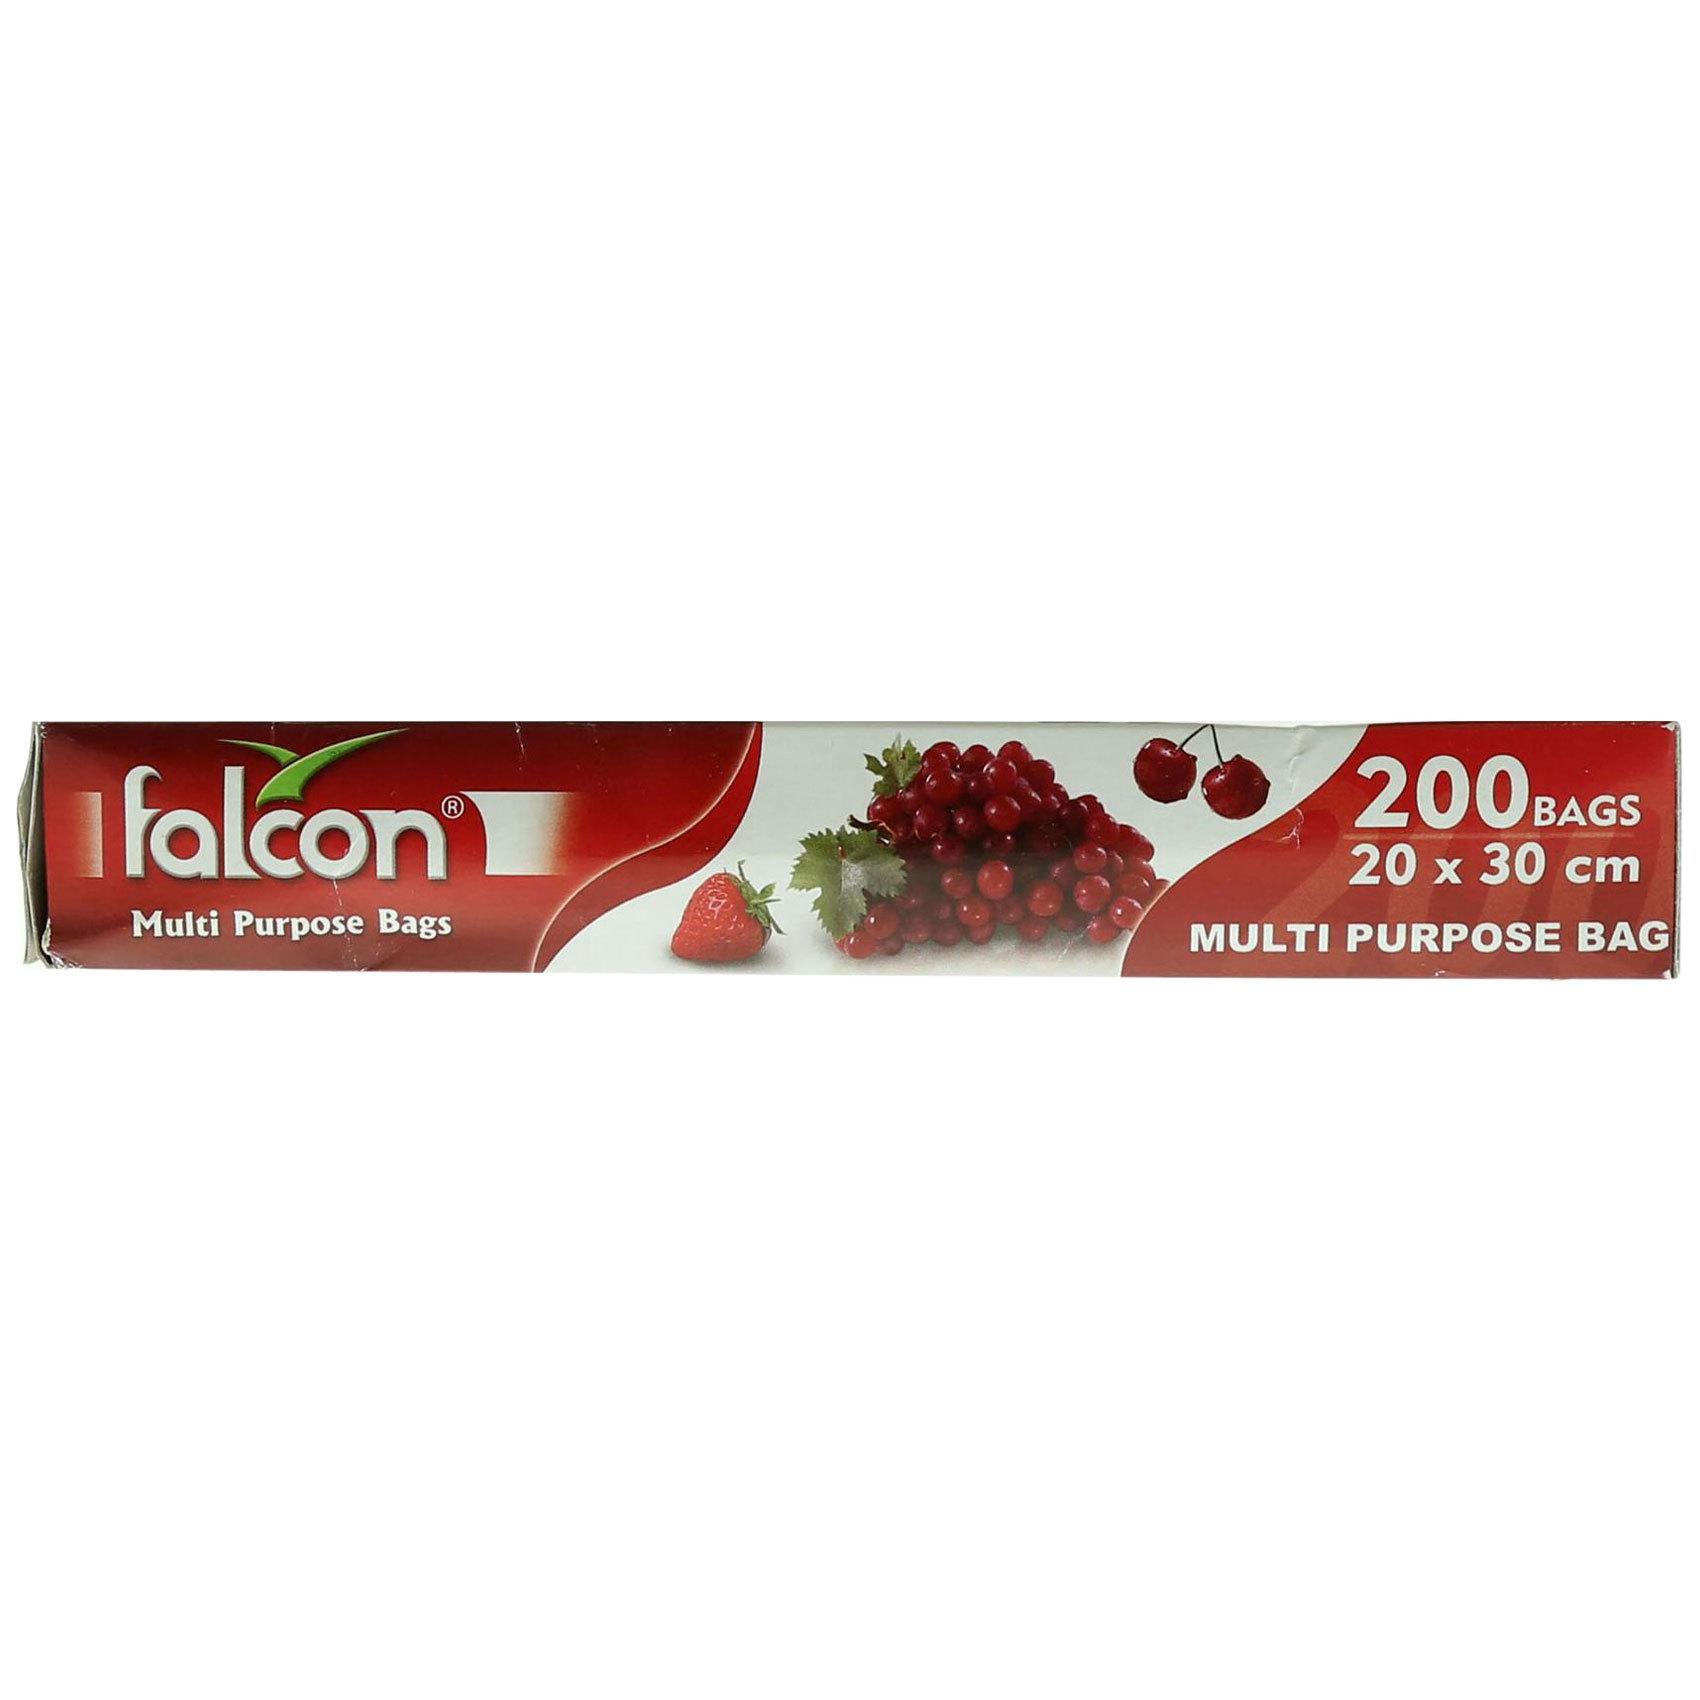 FALCON BAG 20X30CM(P&C